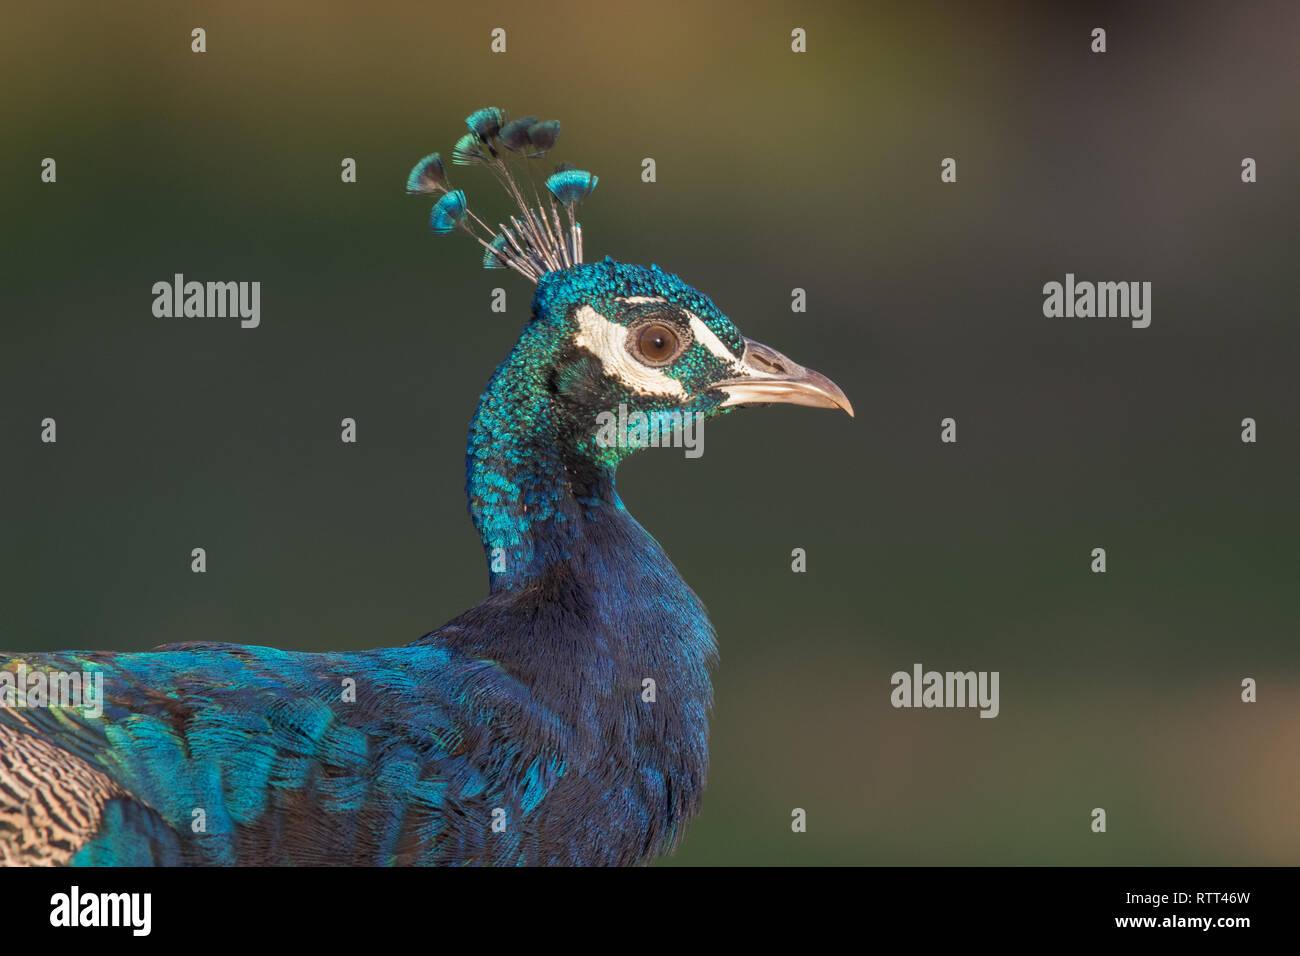 Blue peafowl (Pavo cristatus) - Stock Image